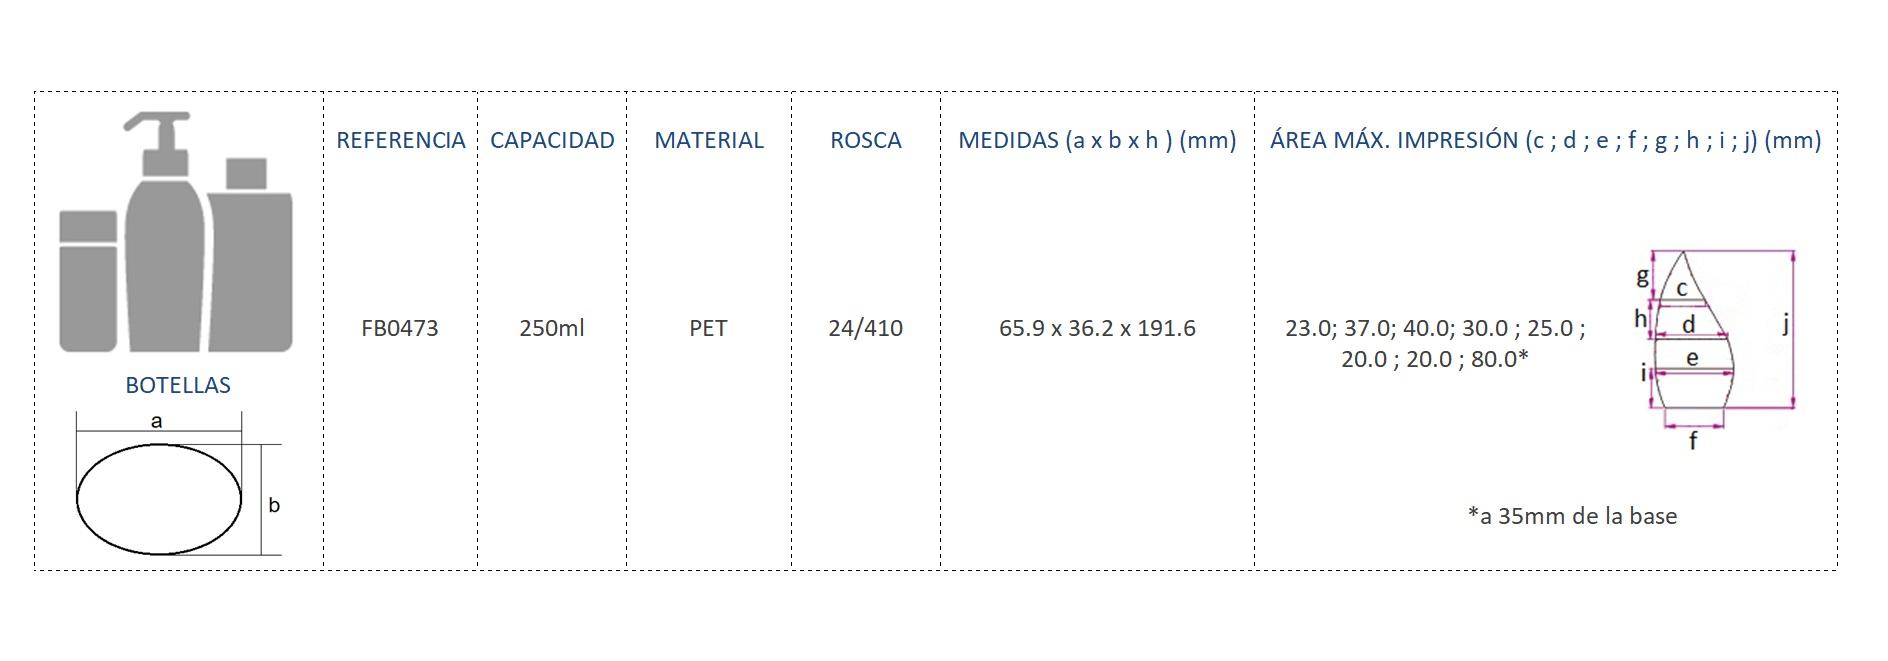 Cuadro de materiales botella FB0473